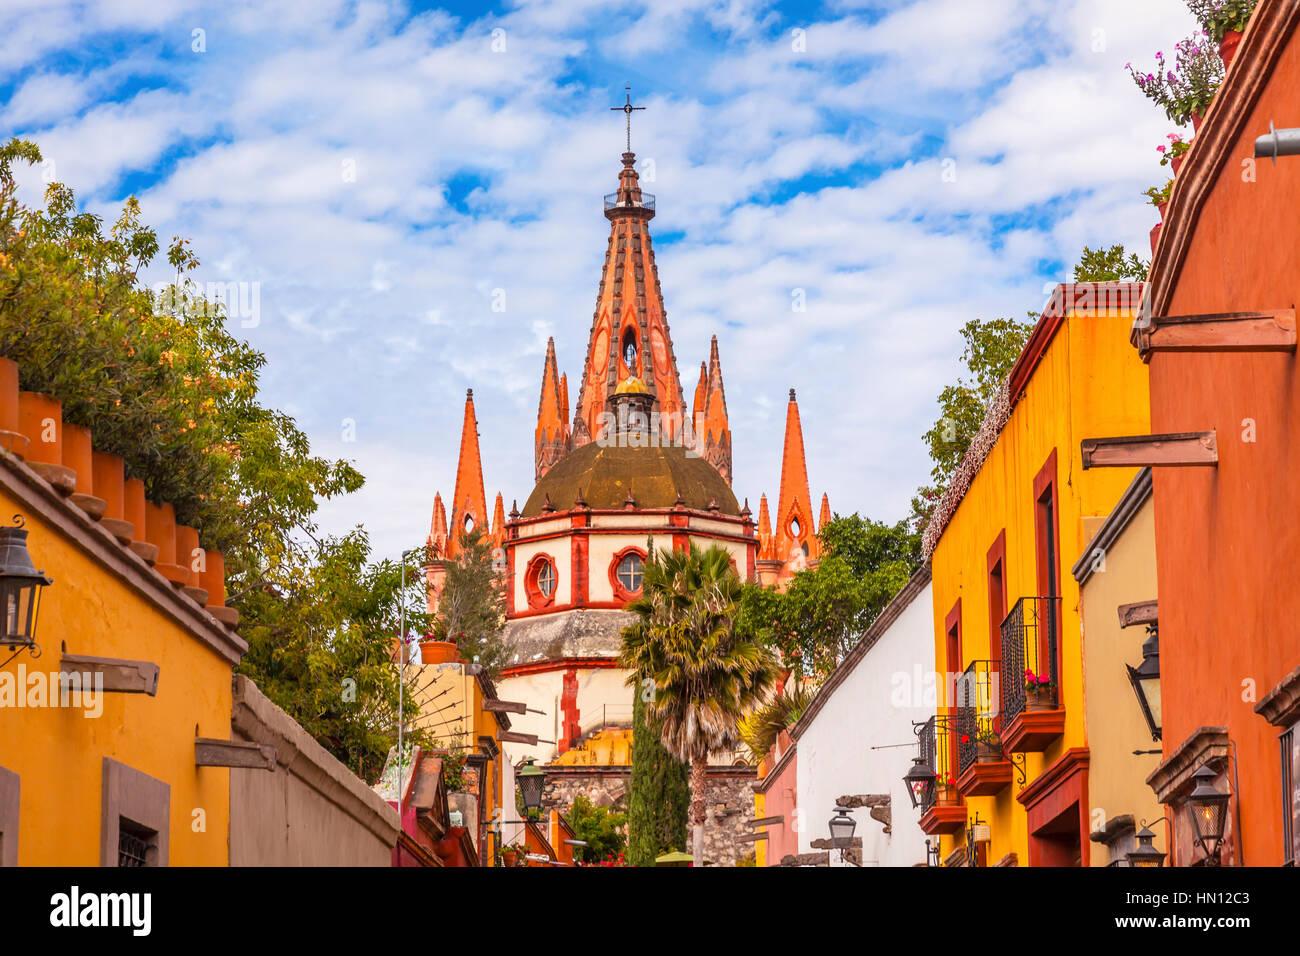 Aldama Street Parroquia Archangel church Dome Steeple San Miguel de Allende, Mexico. Parroaguia created in 1600s. Stock Photo